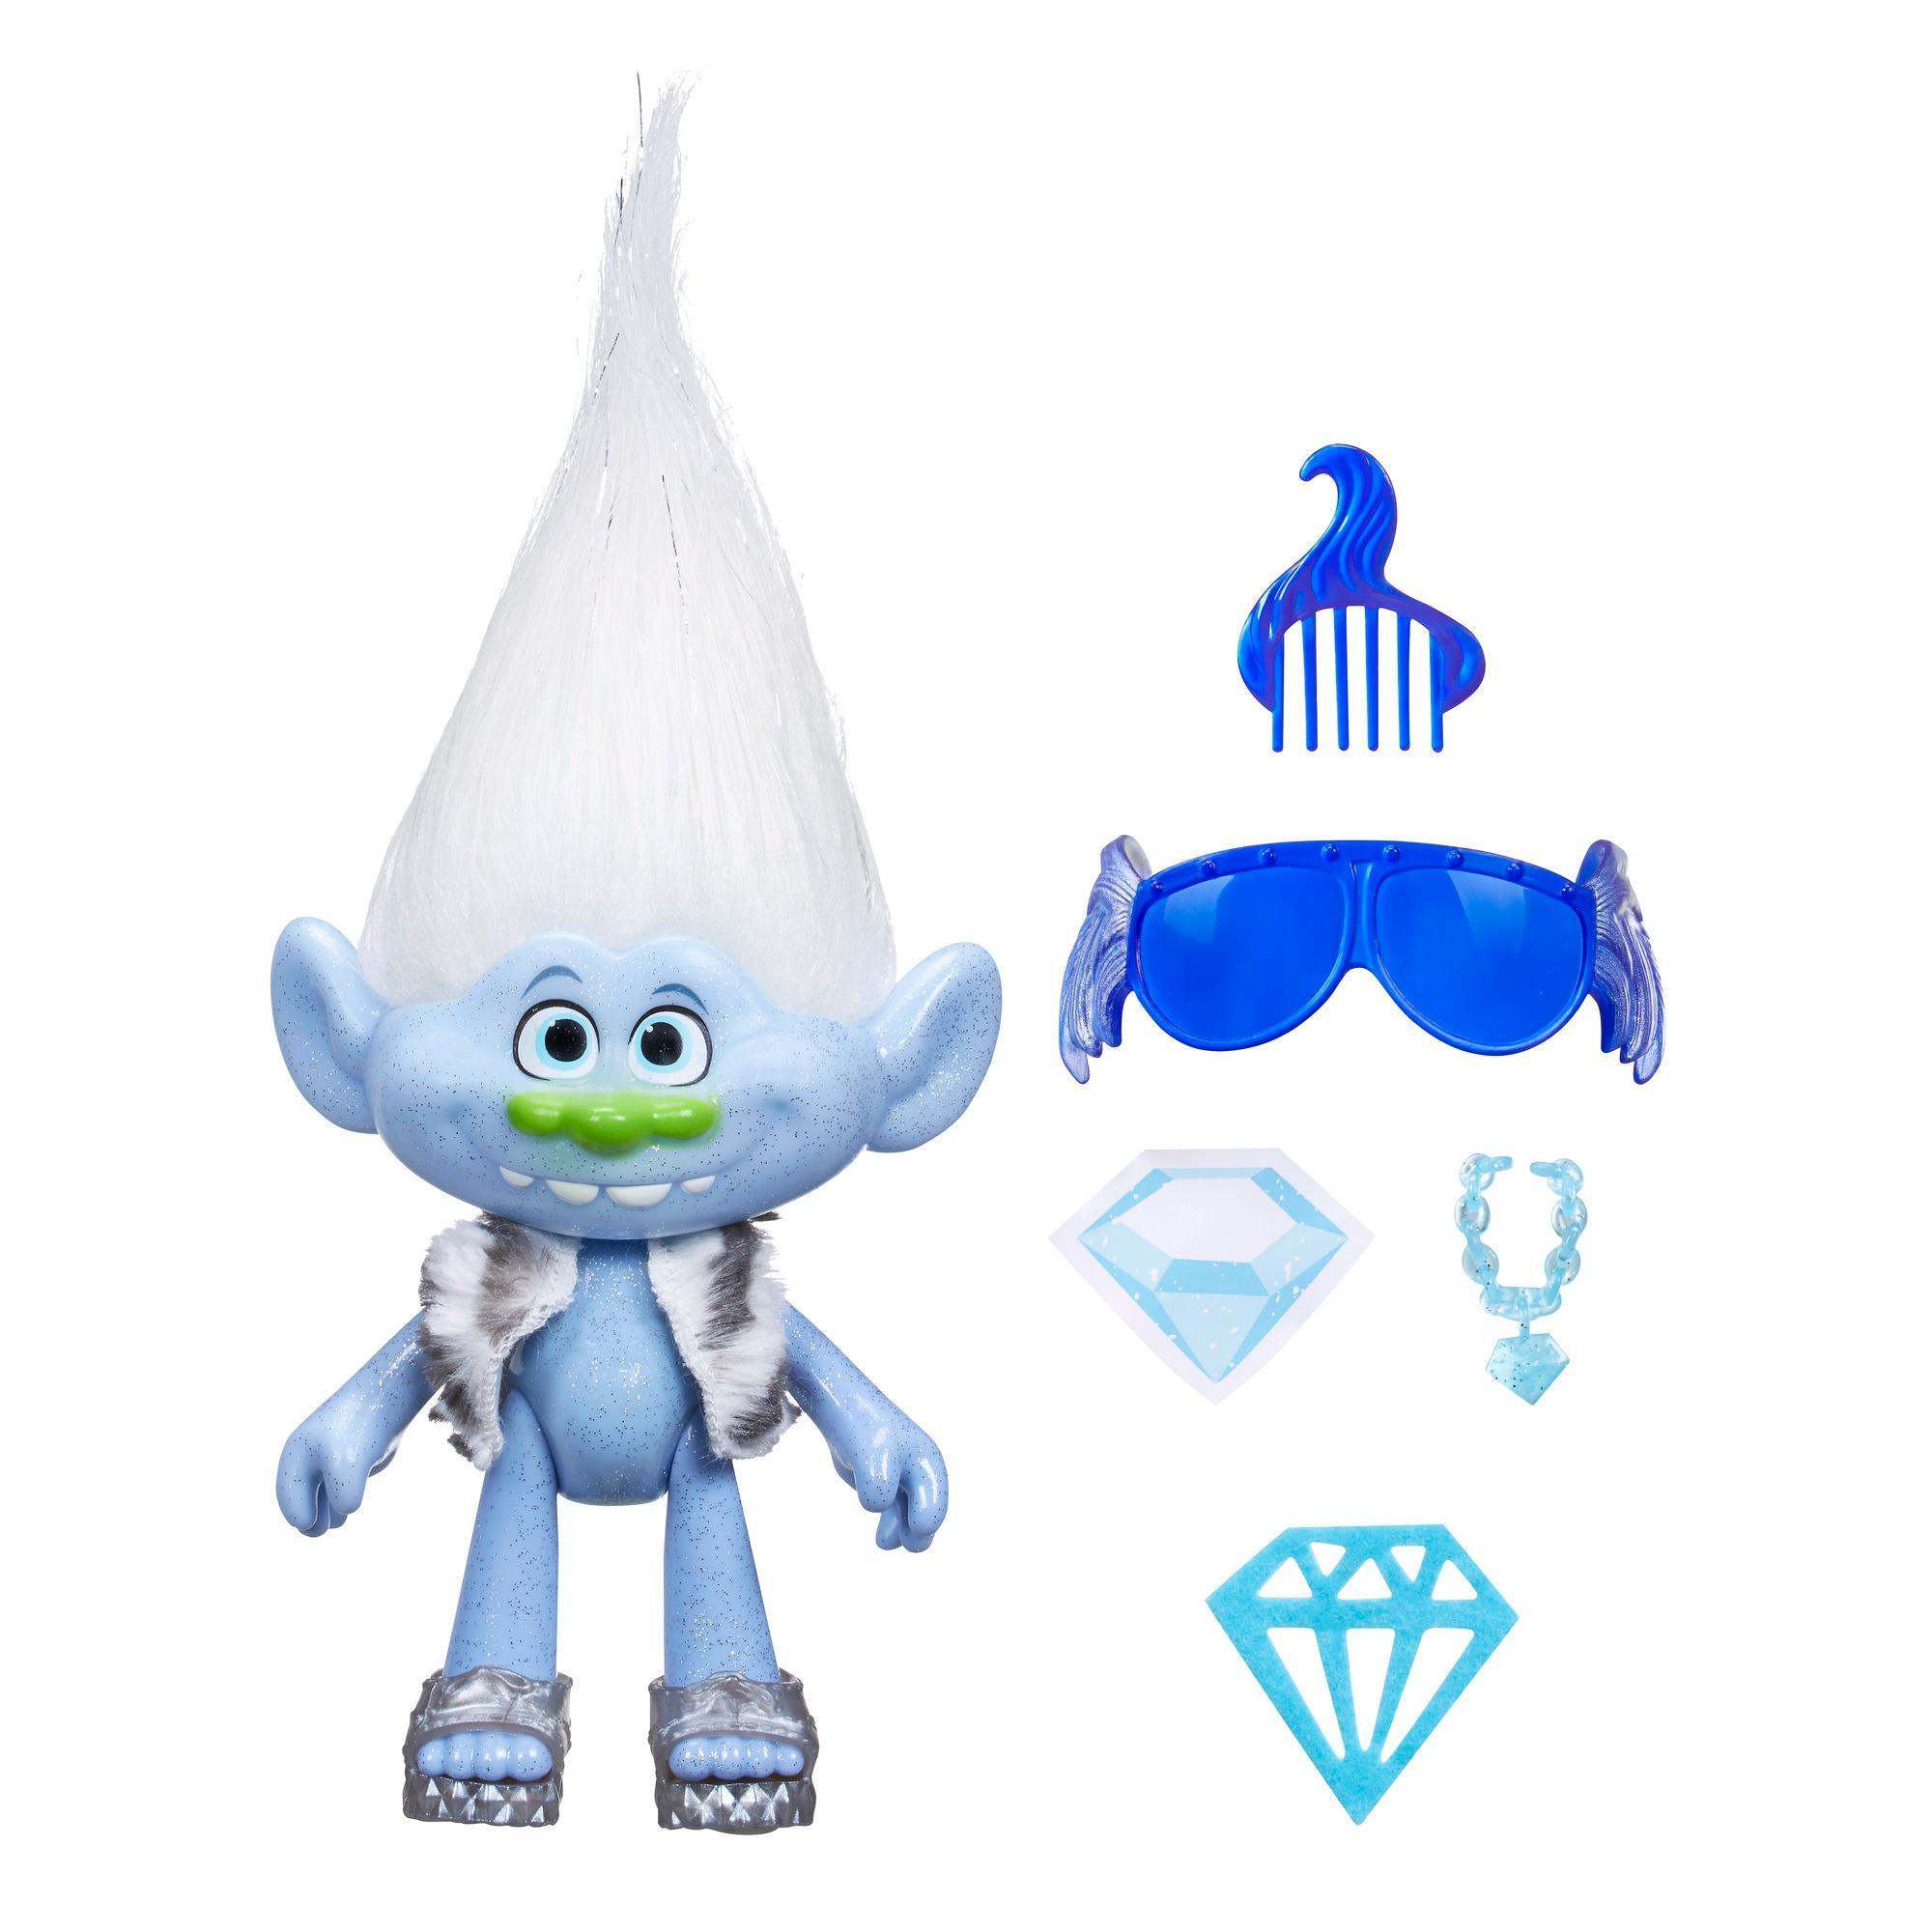 Trolls. Фигурка Тролли - Алмаз с аксессуарамиТролли игрушки<br>Trolls. Фигурка Тролли - Алмаз с аксессуарами<br>